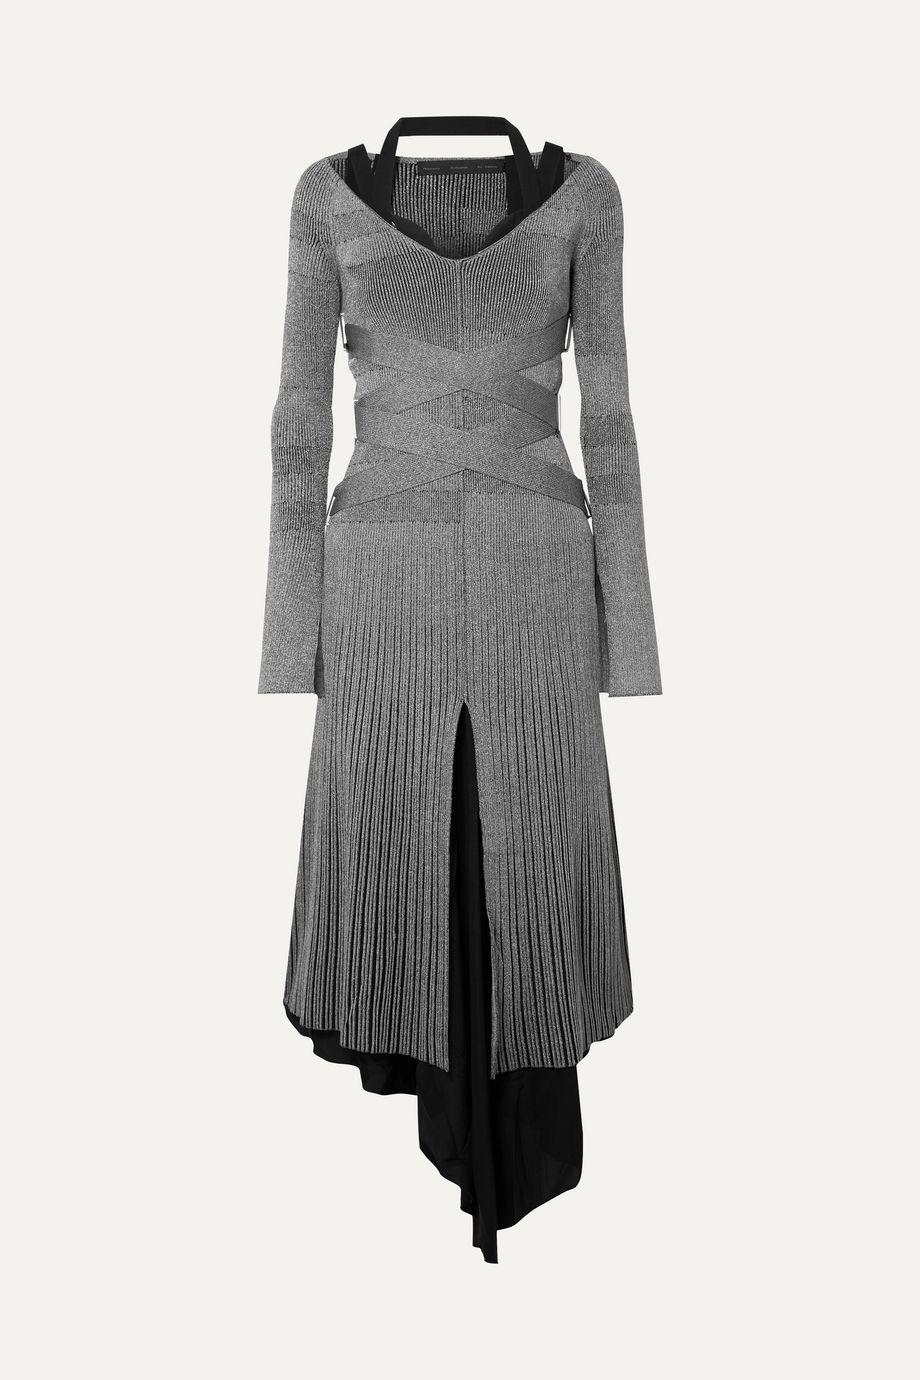 Proenza Schouler Metallic ribbed-knit midi dress